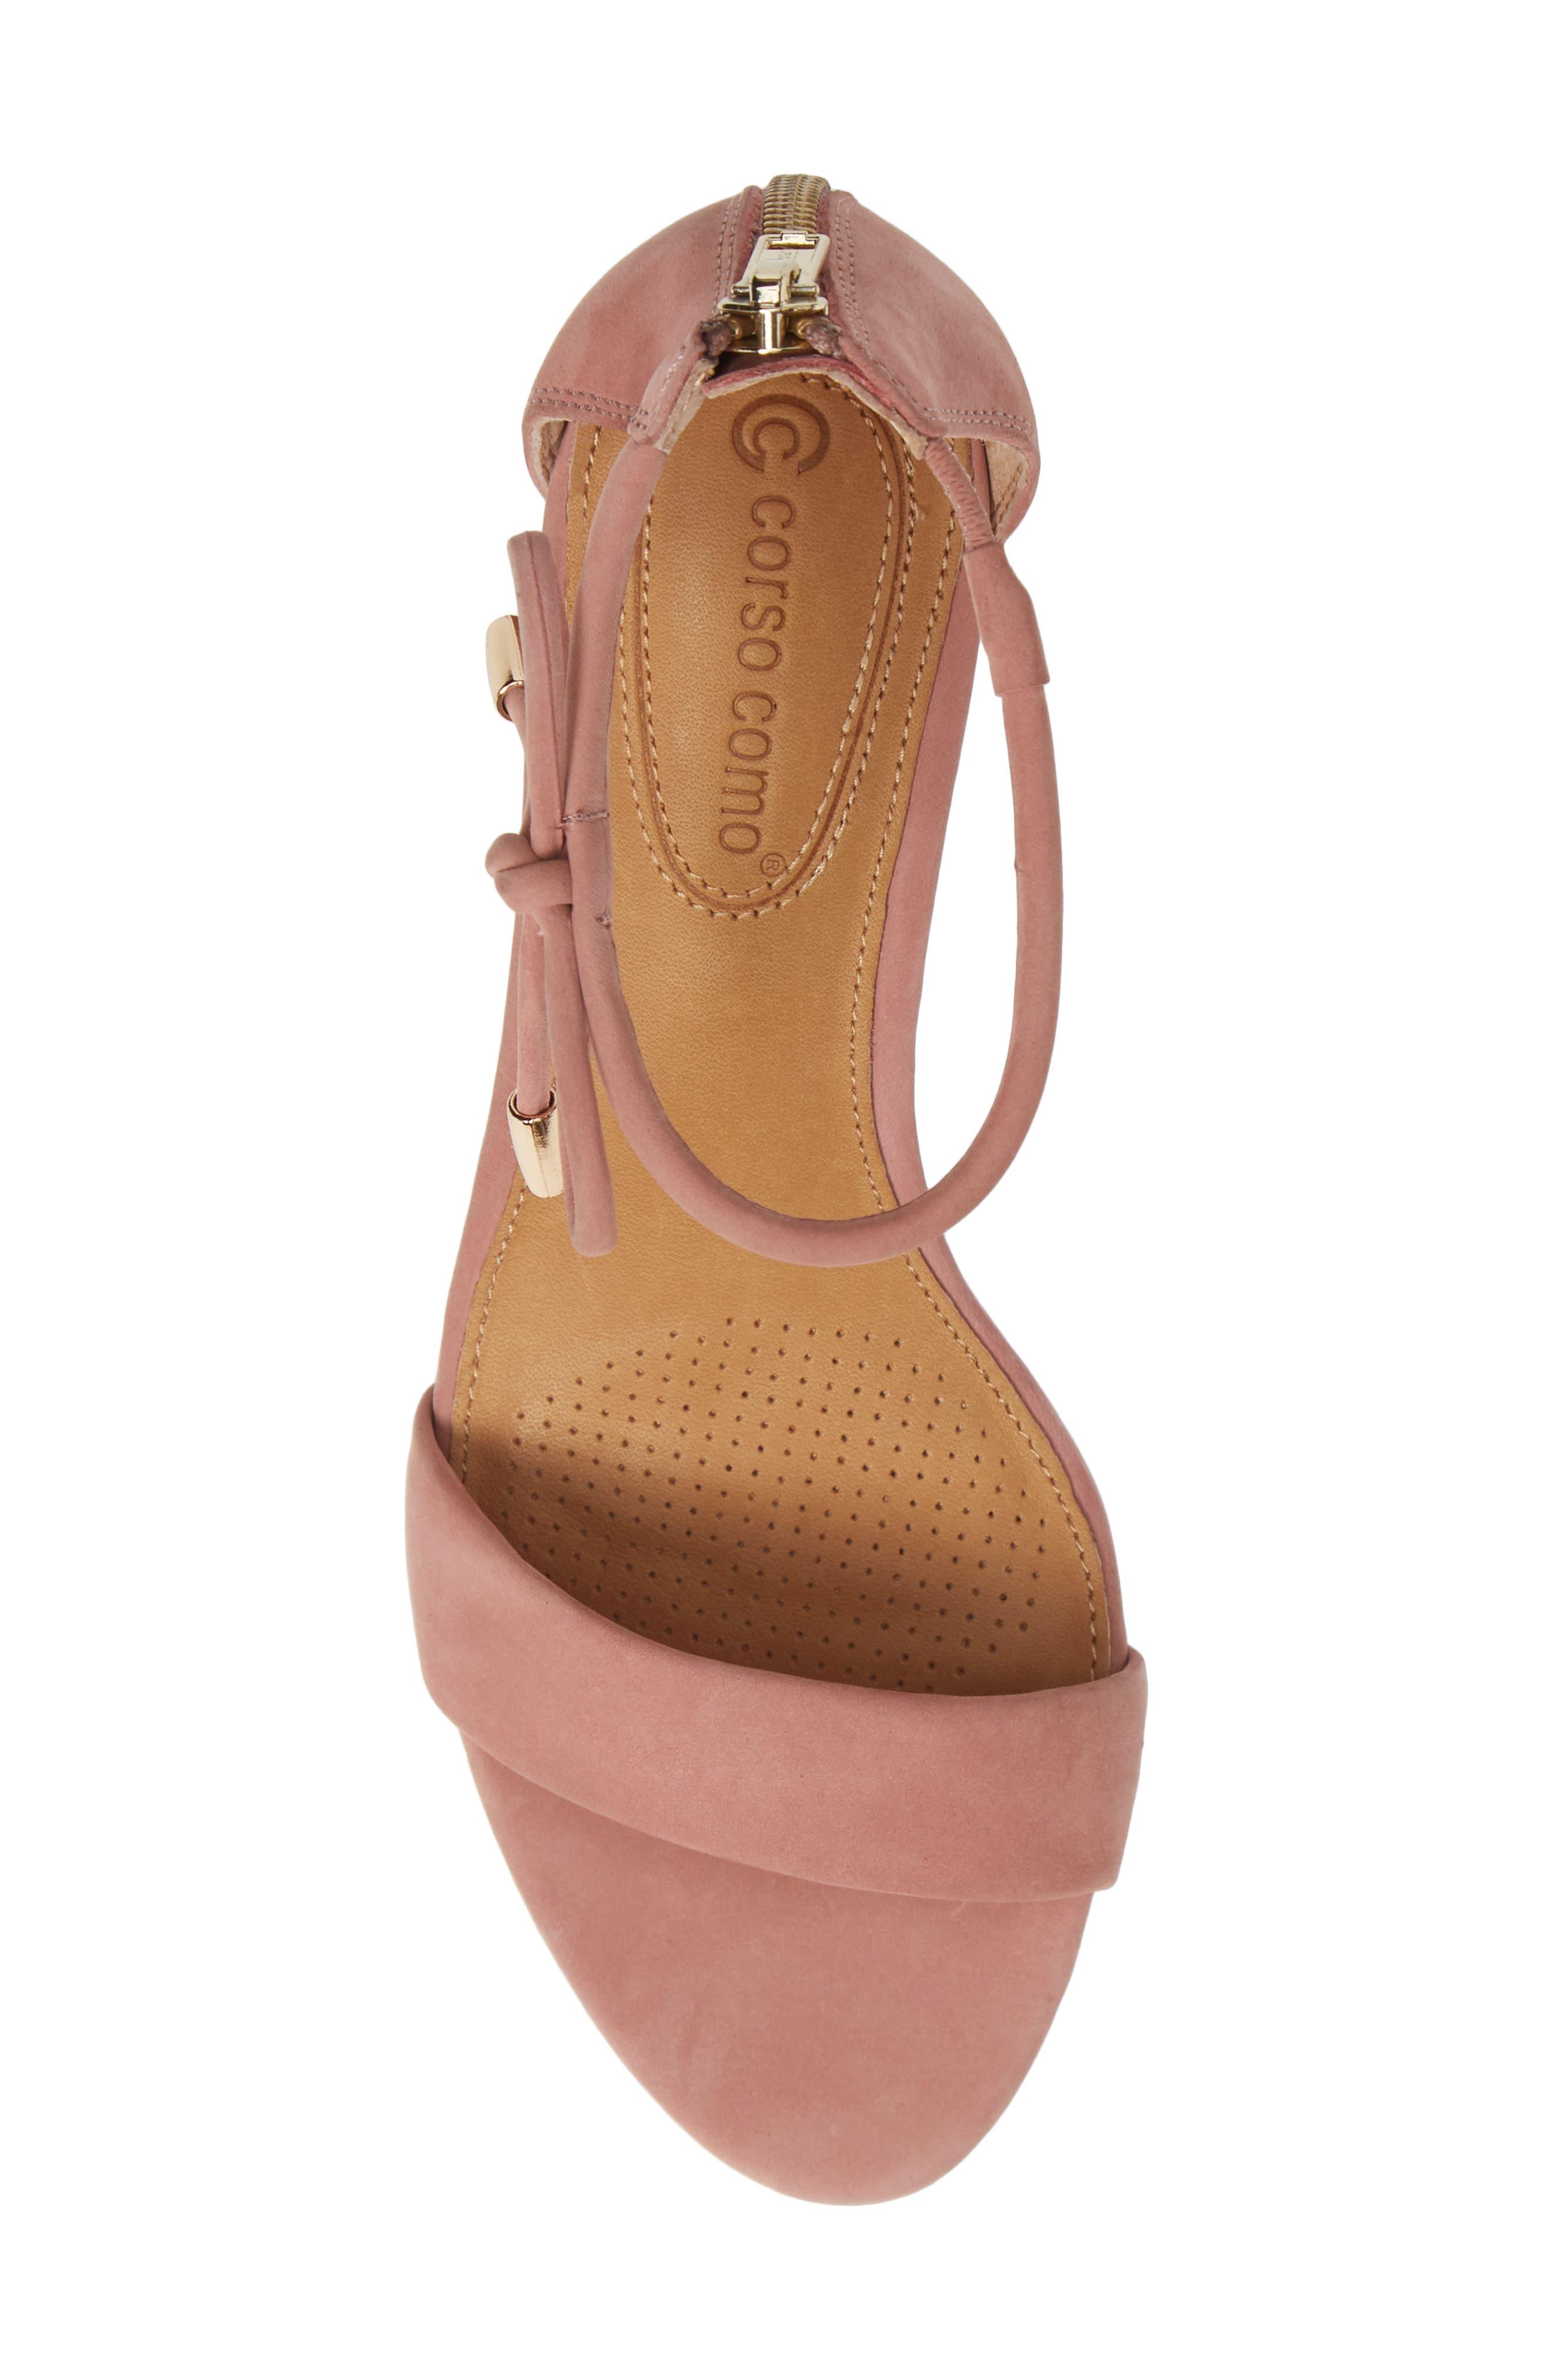 Celebratt Ankle Strap Sandal,                             Alternate thumbnail 5, color,                             OLD ROSE NUBUCK LEATHER